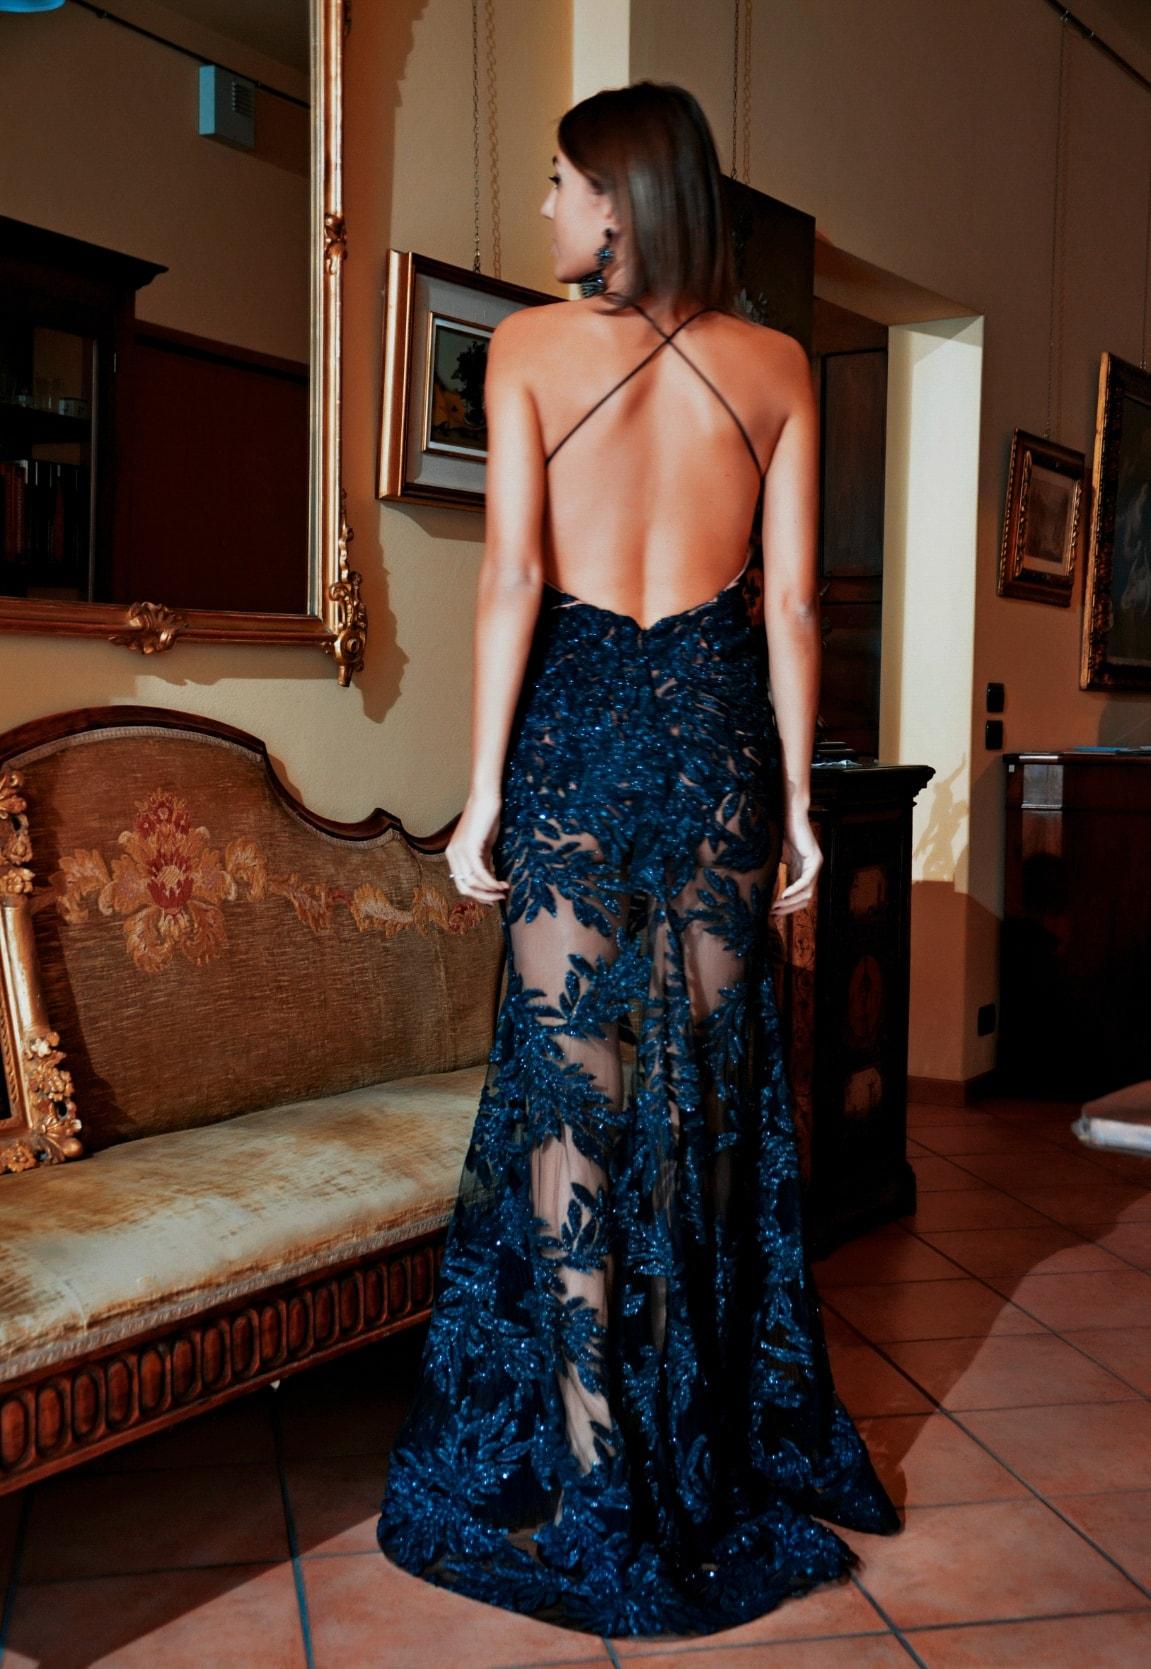 Abiti Da Cerimonia Nadine.Stella Dress From Nadine Merabi Welcome To My World